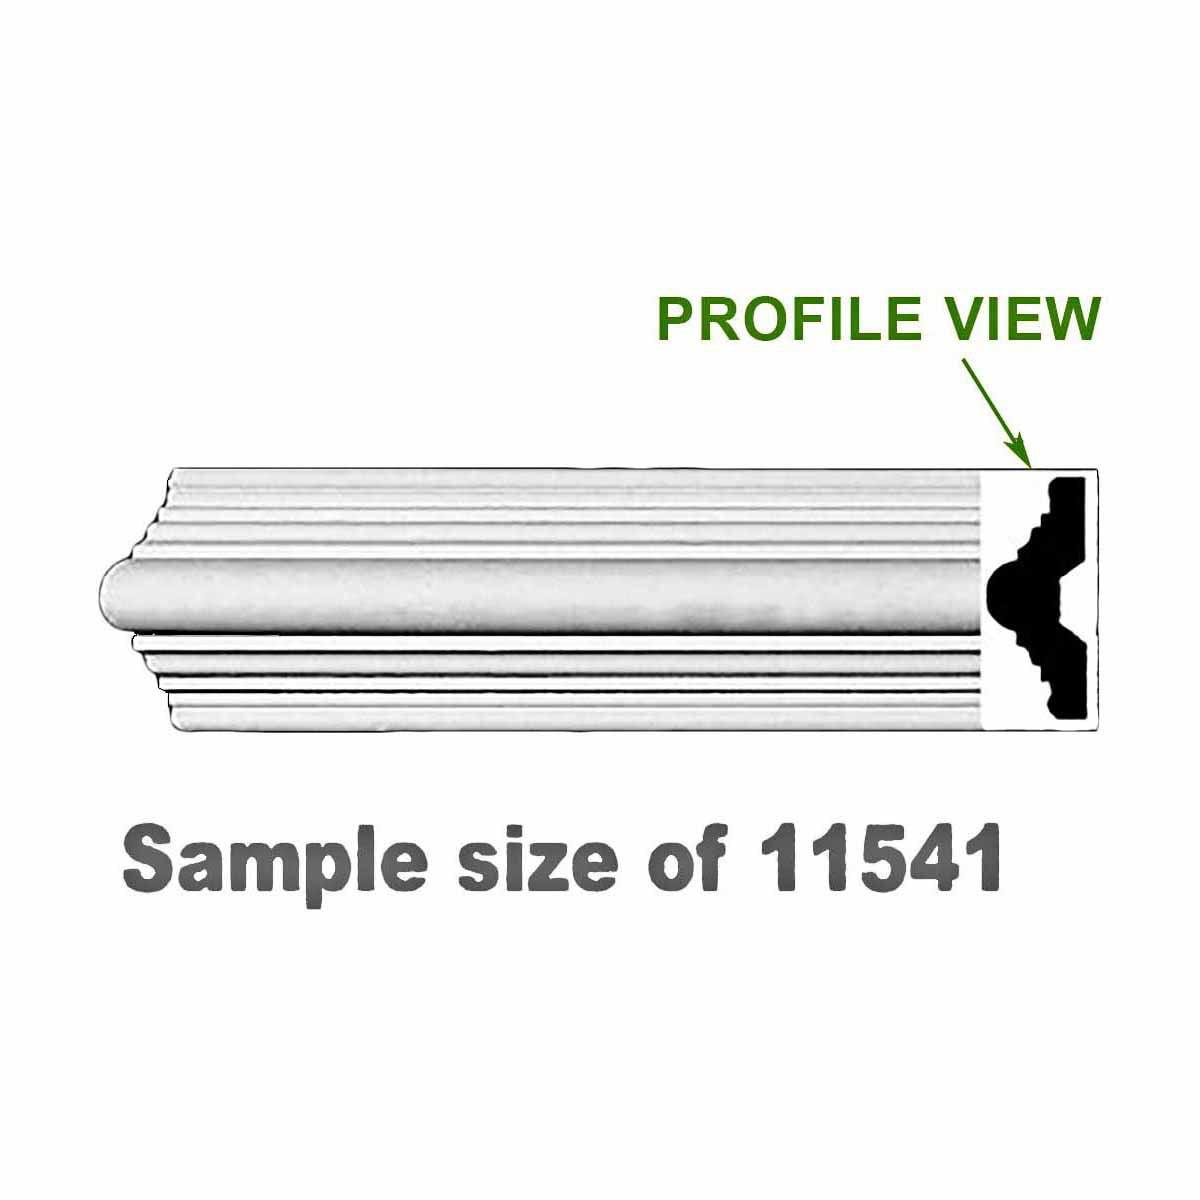 "Cornice White Urethane 23.5"" Sample of 11541 | Renovator's Supply"